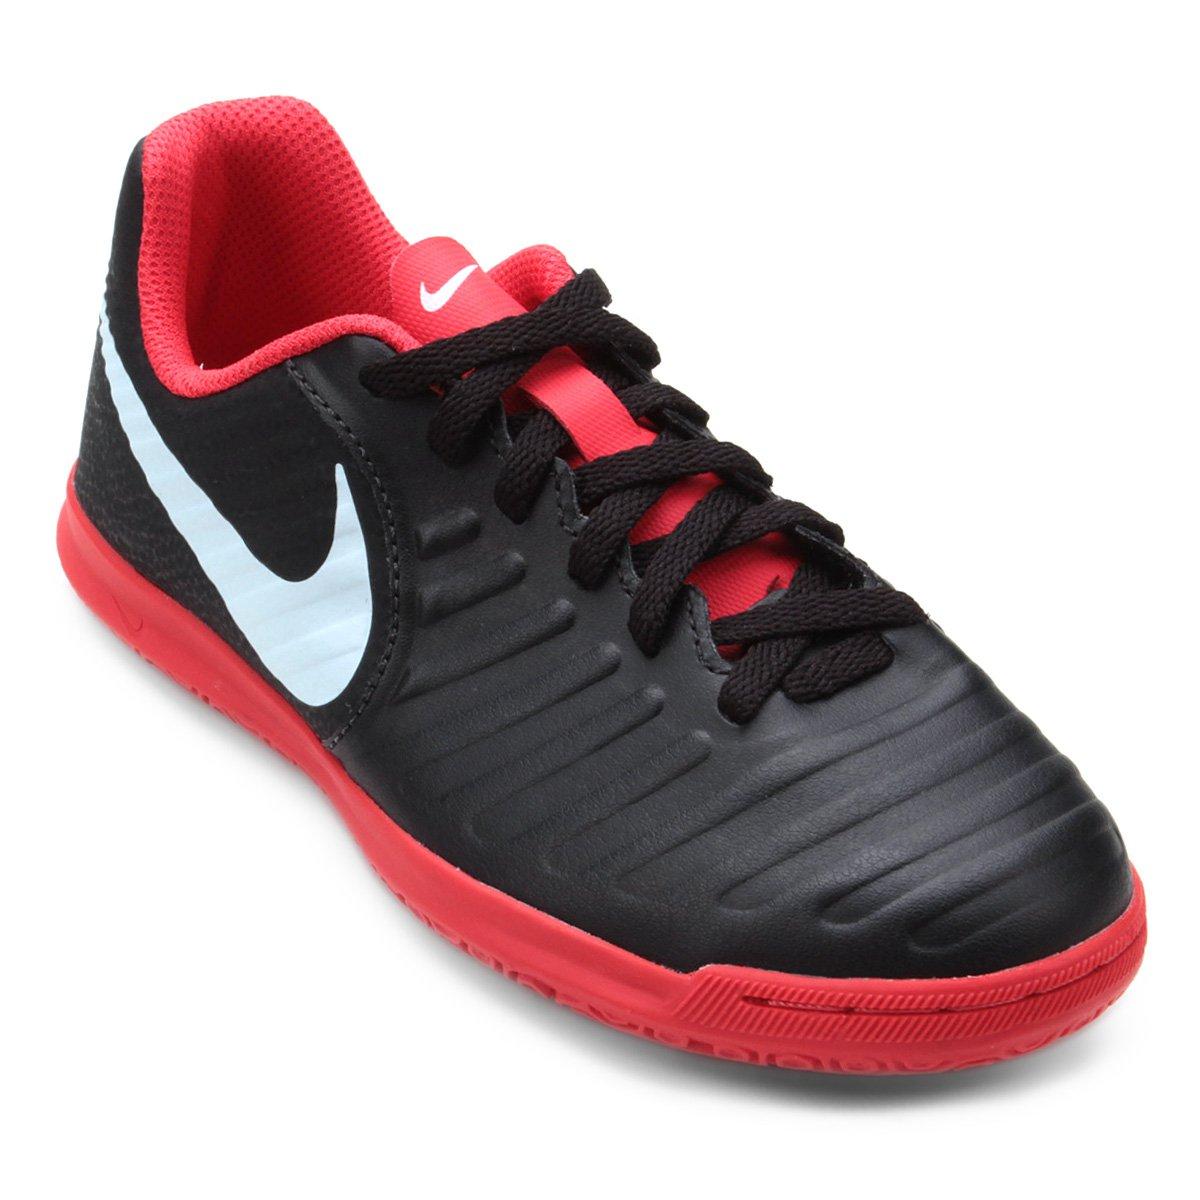 981cb593b5 Chuteira Futsal Infantil Nike Tiempo Legend 7 Club IC - Compre Agora ...